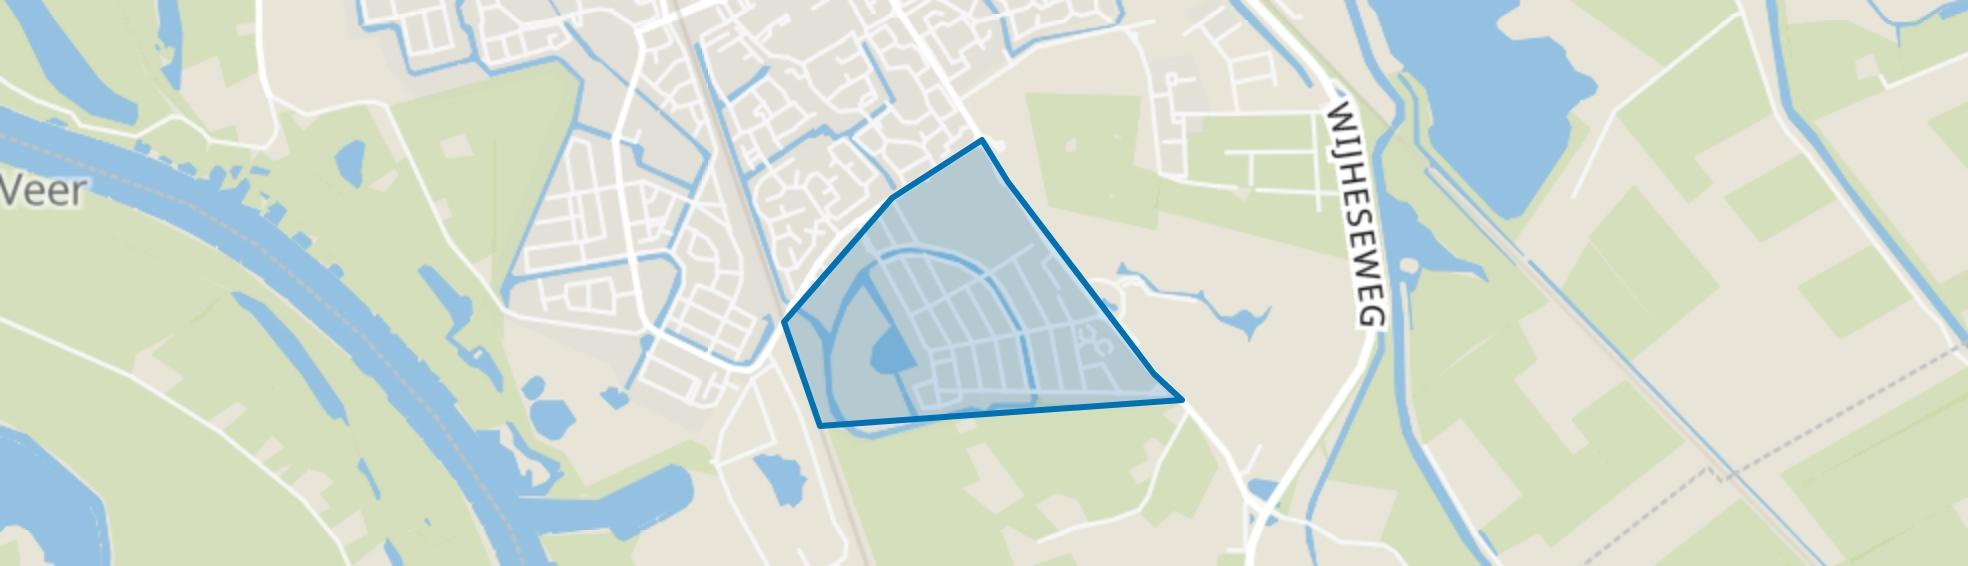 Ittersumerbroek, Zwolle map